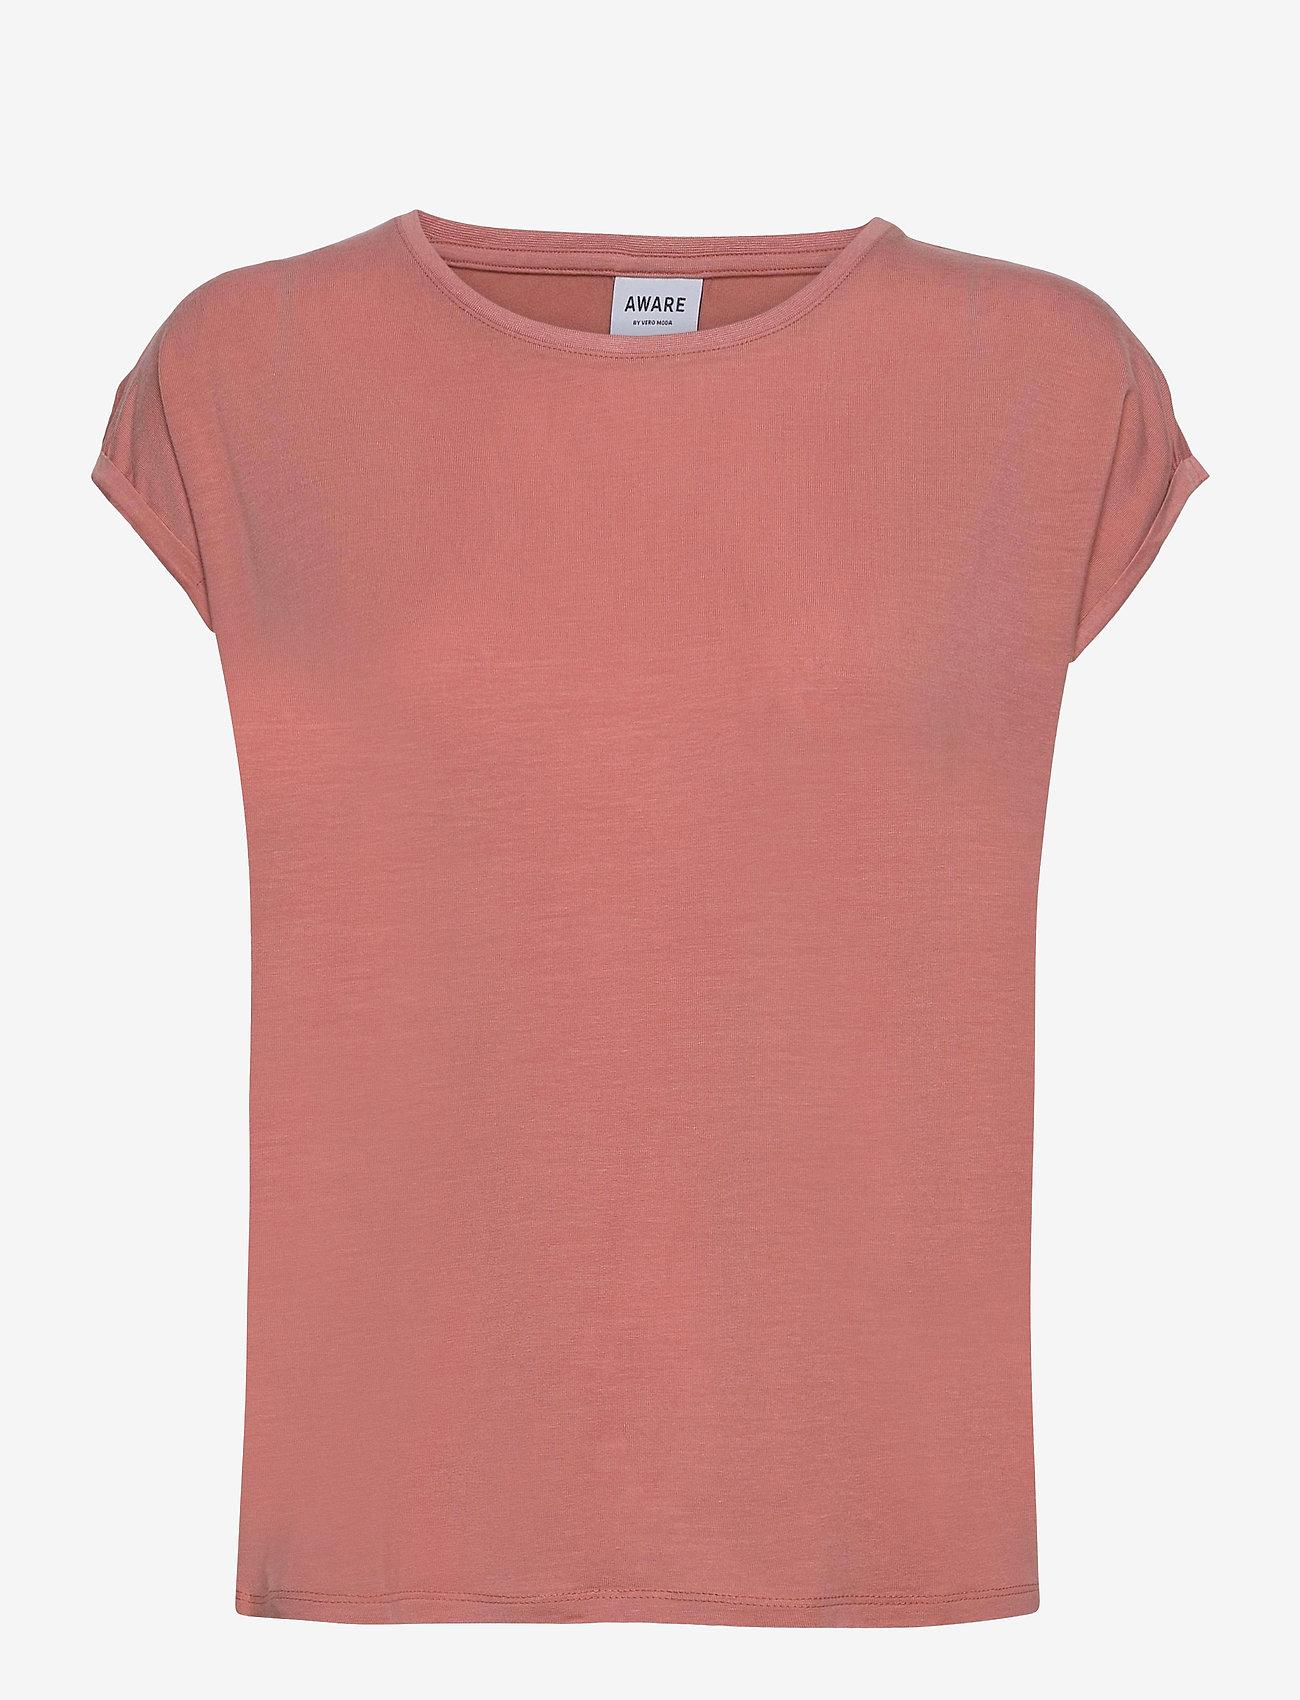 Vero Moda - VMAVA PLAIN SS TOP GA - t-shirts - old rose - 0